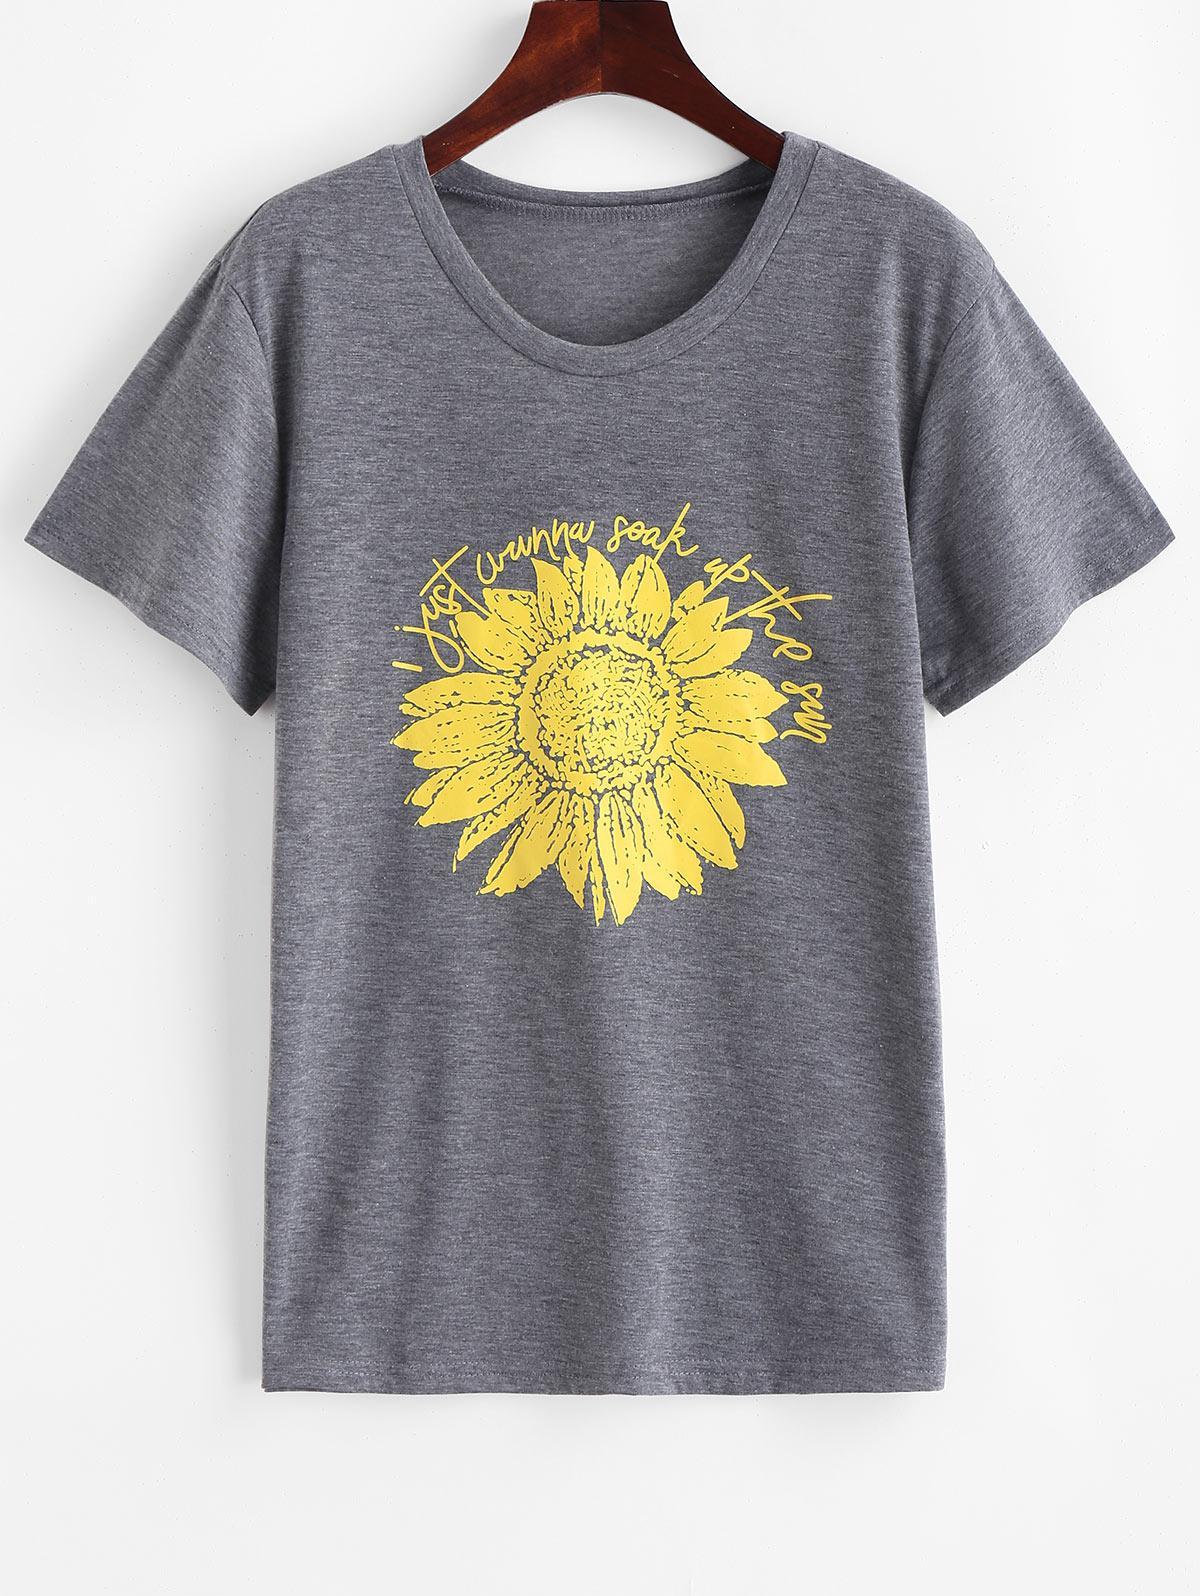 Flower Letter Graphic Short Sleeves Tee, Gray